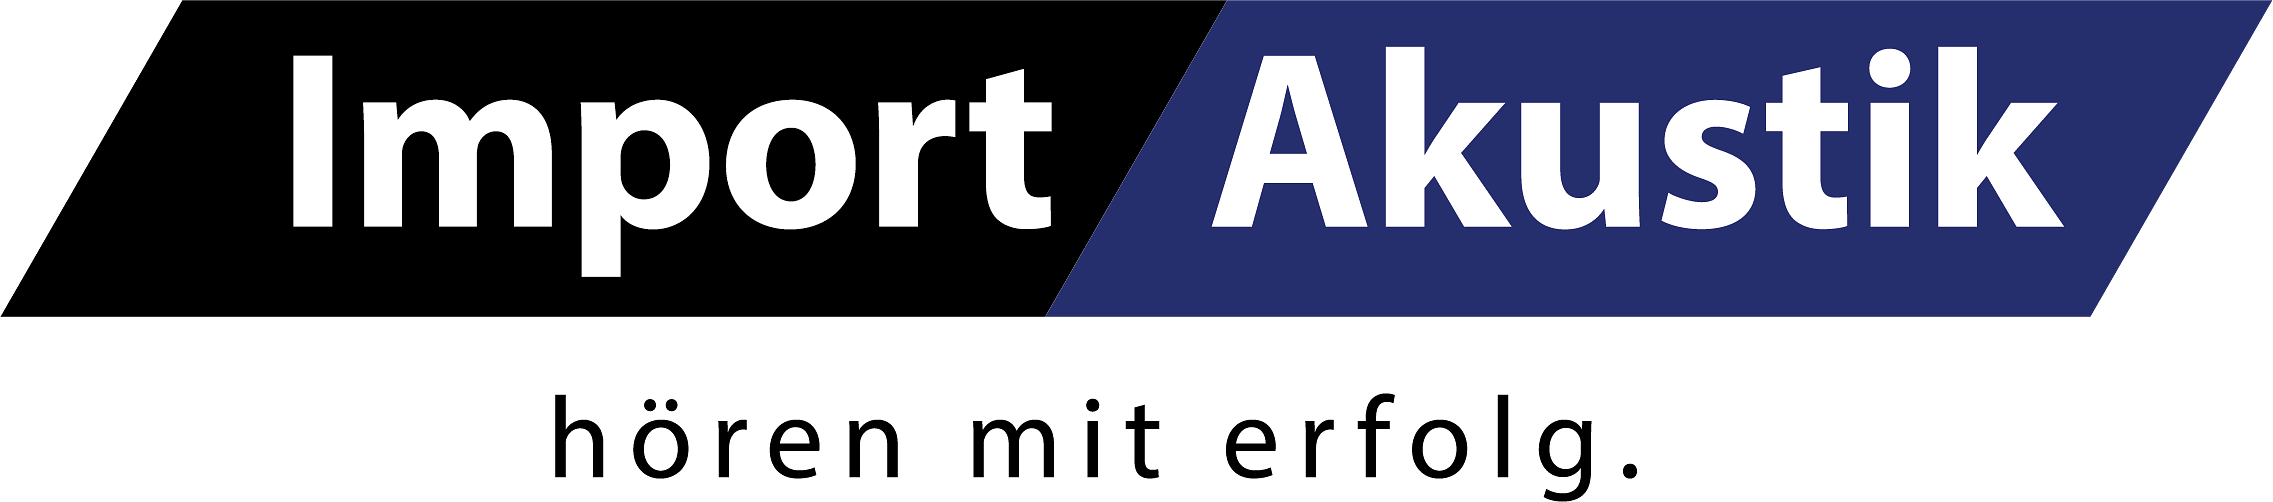 Import Akustik Egerkingen GmbH